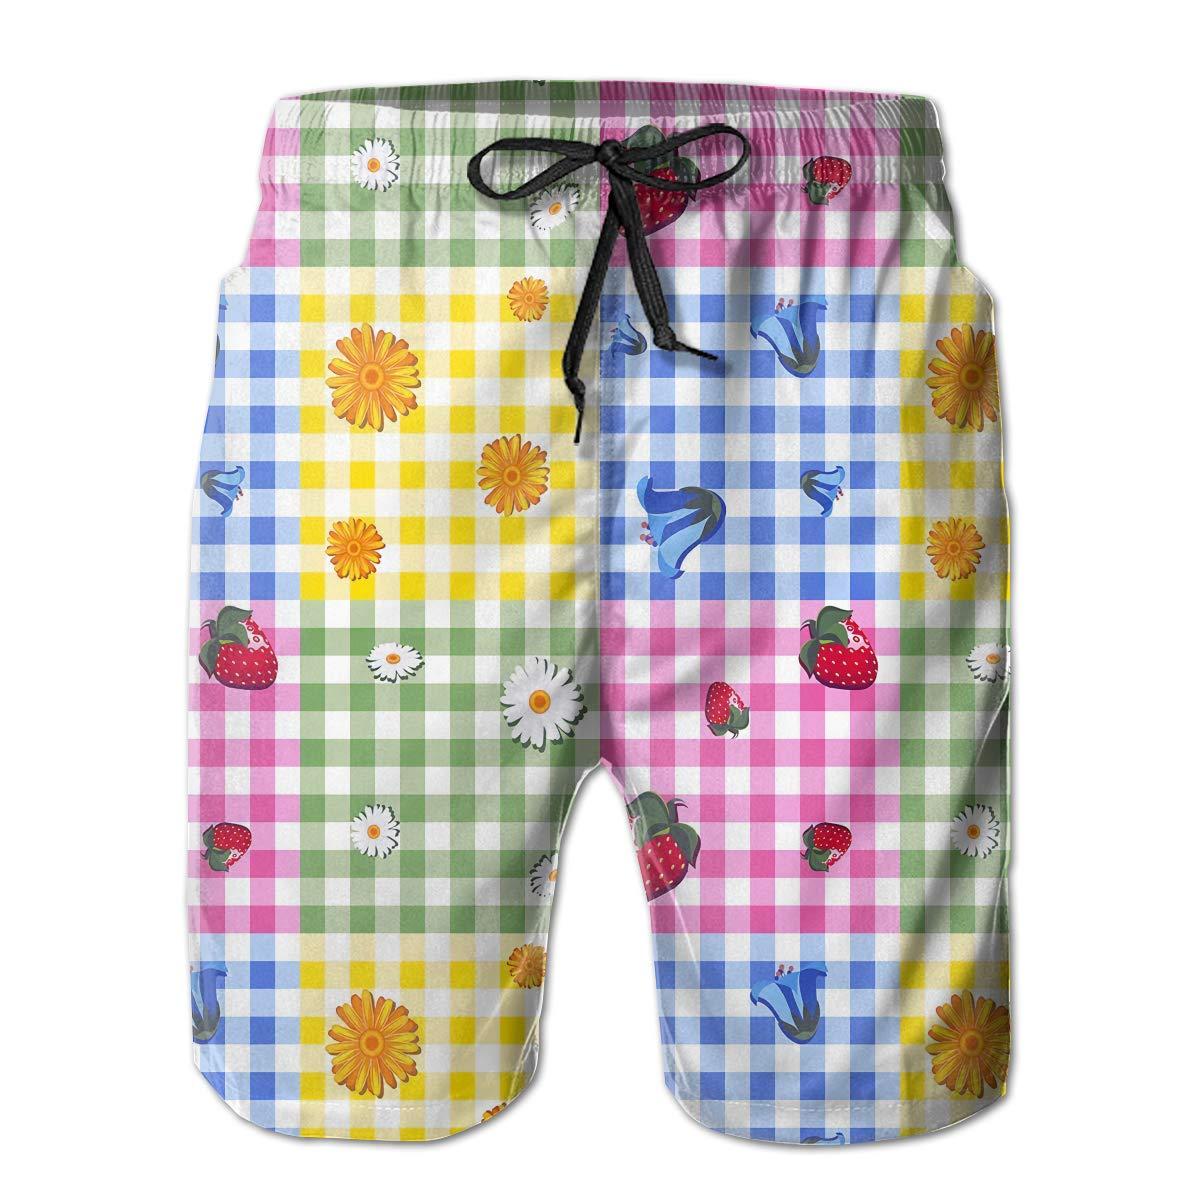 Rigg-pants Mens Soft Hawaii Surfing Tour Funny Beach Shorts Swim Trunks Board Shorts